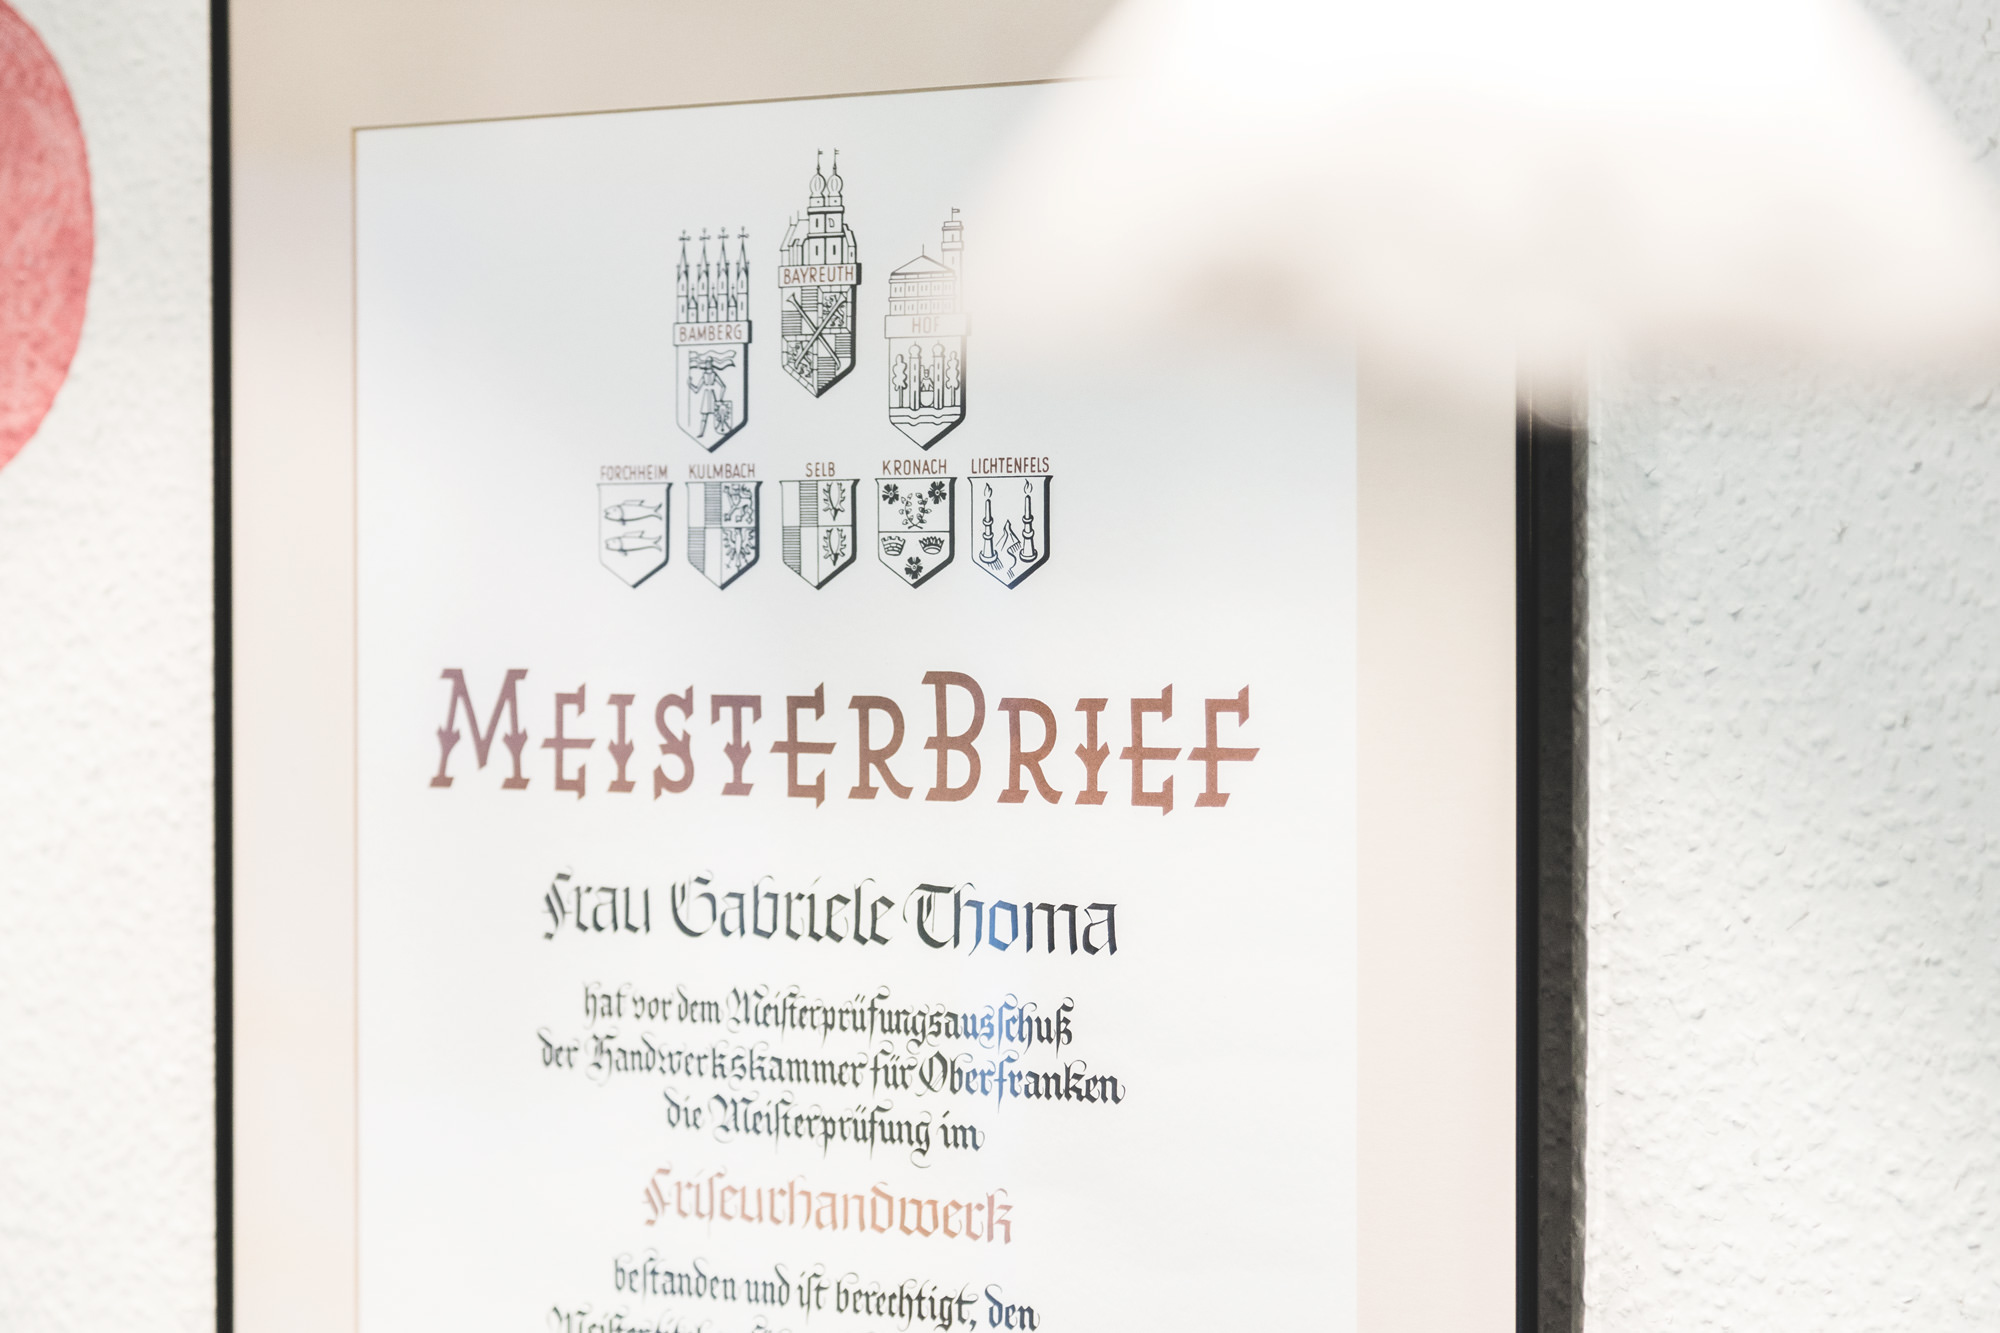 Friseur_Thoma_Meister_Betrieb